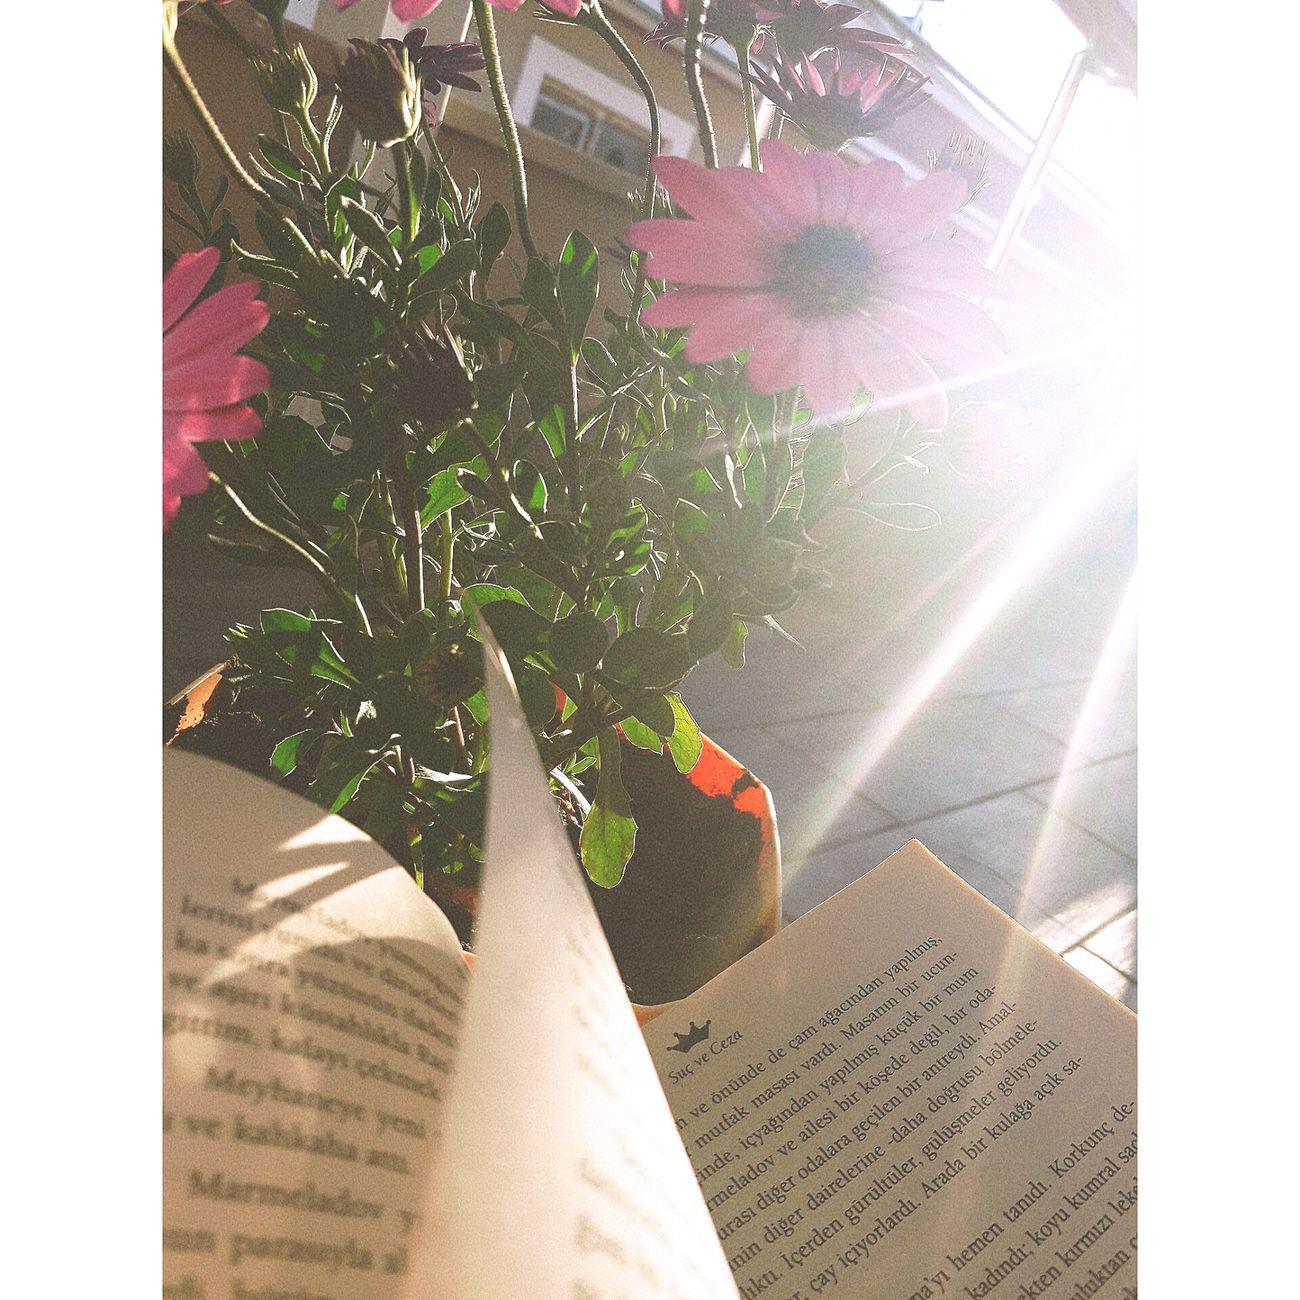 Day Sunlight Window Indoors  No People Close-up Nature Green Green Green!  Throwback TBT  EyeEm Diversity Green Green Green!  Women City Flower Flowers Books Book Bookshelf Bookphoto Booking A Room Bookstore Bookstagram Bookworm Bookphotography